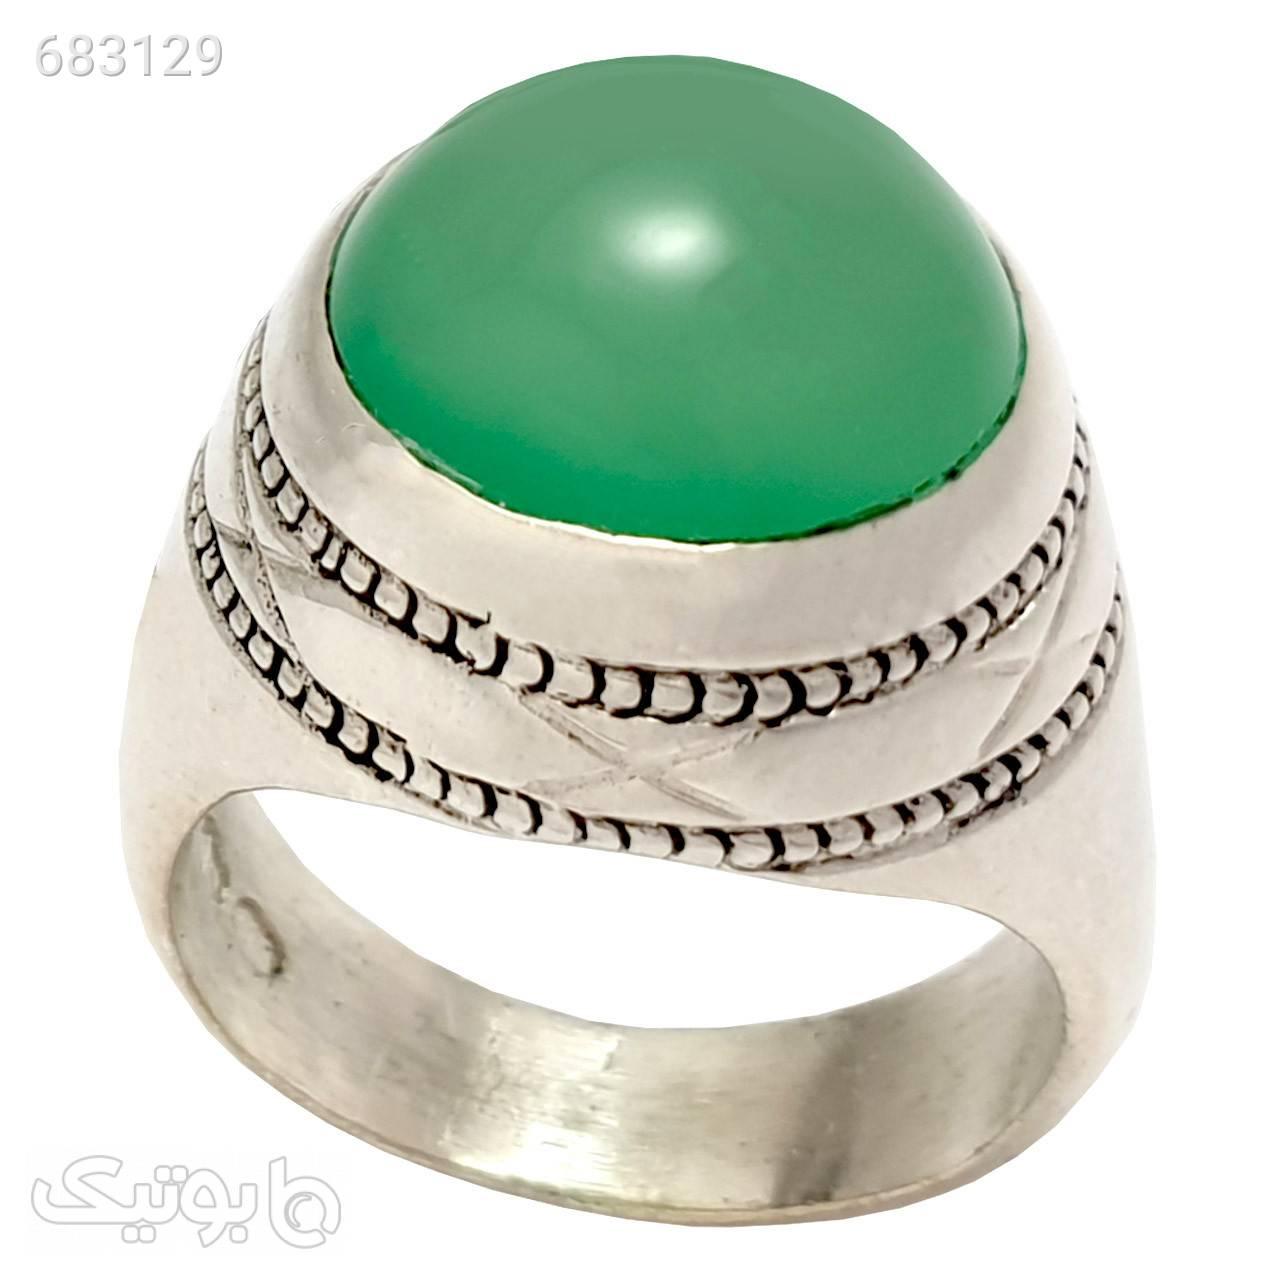 انگشتر نقره مردانه مدل a090jw نقره ای انگشتر